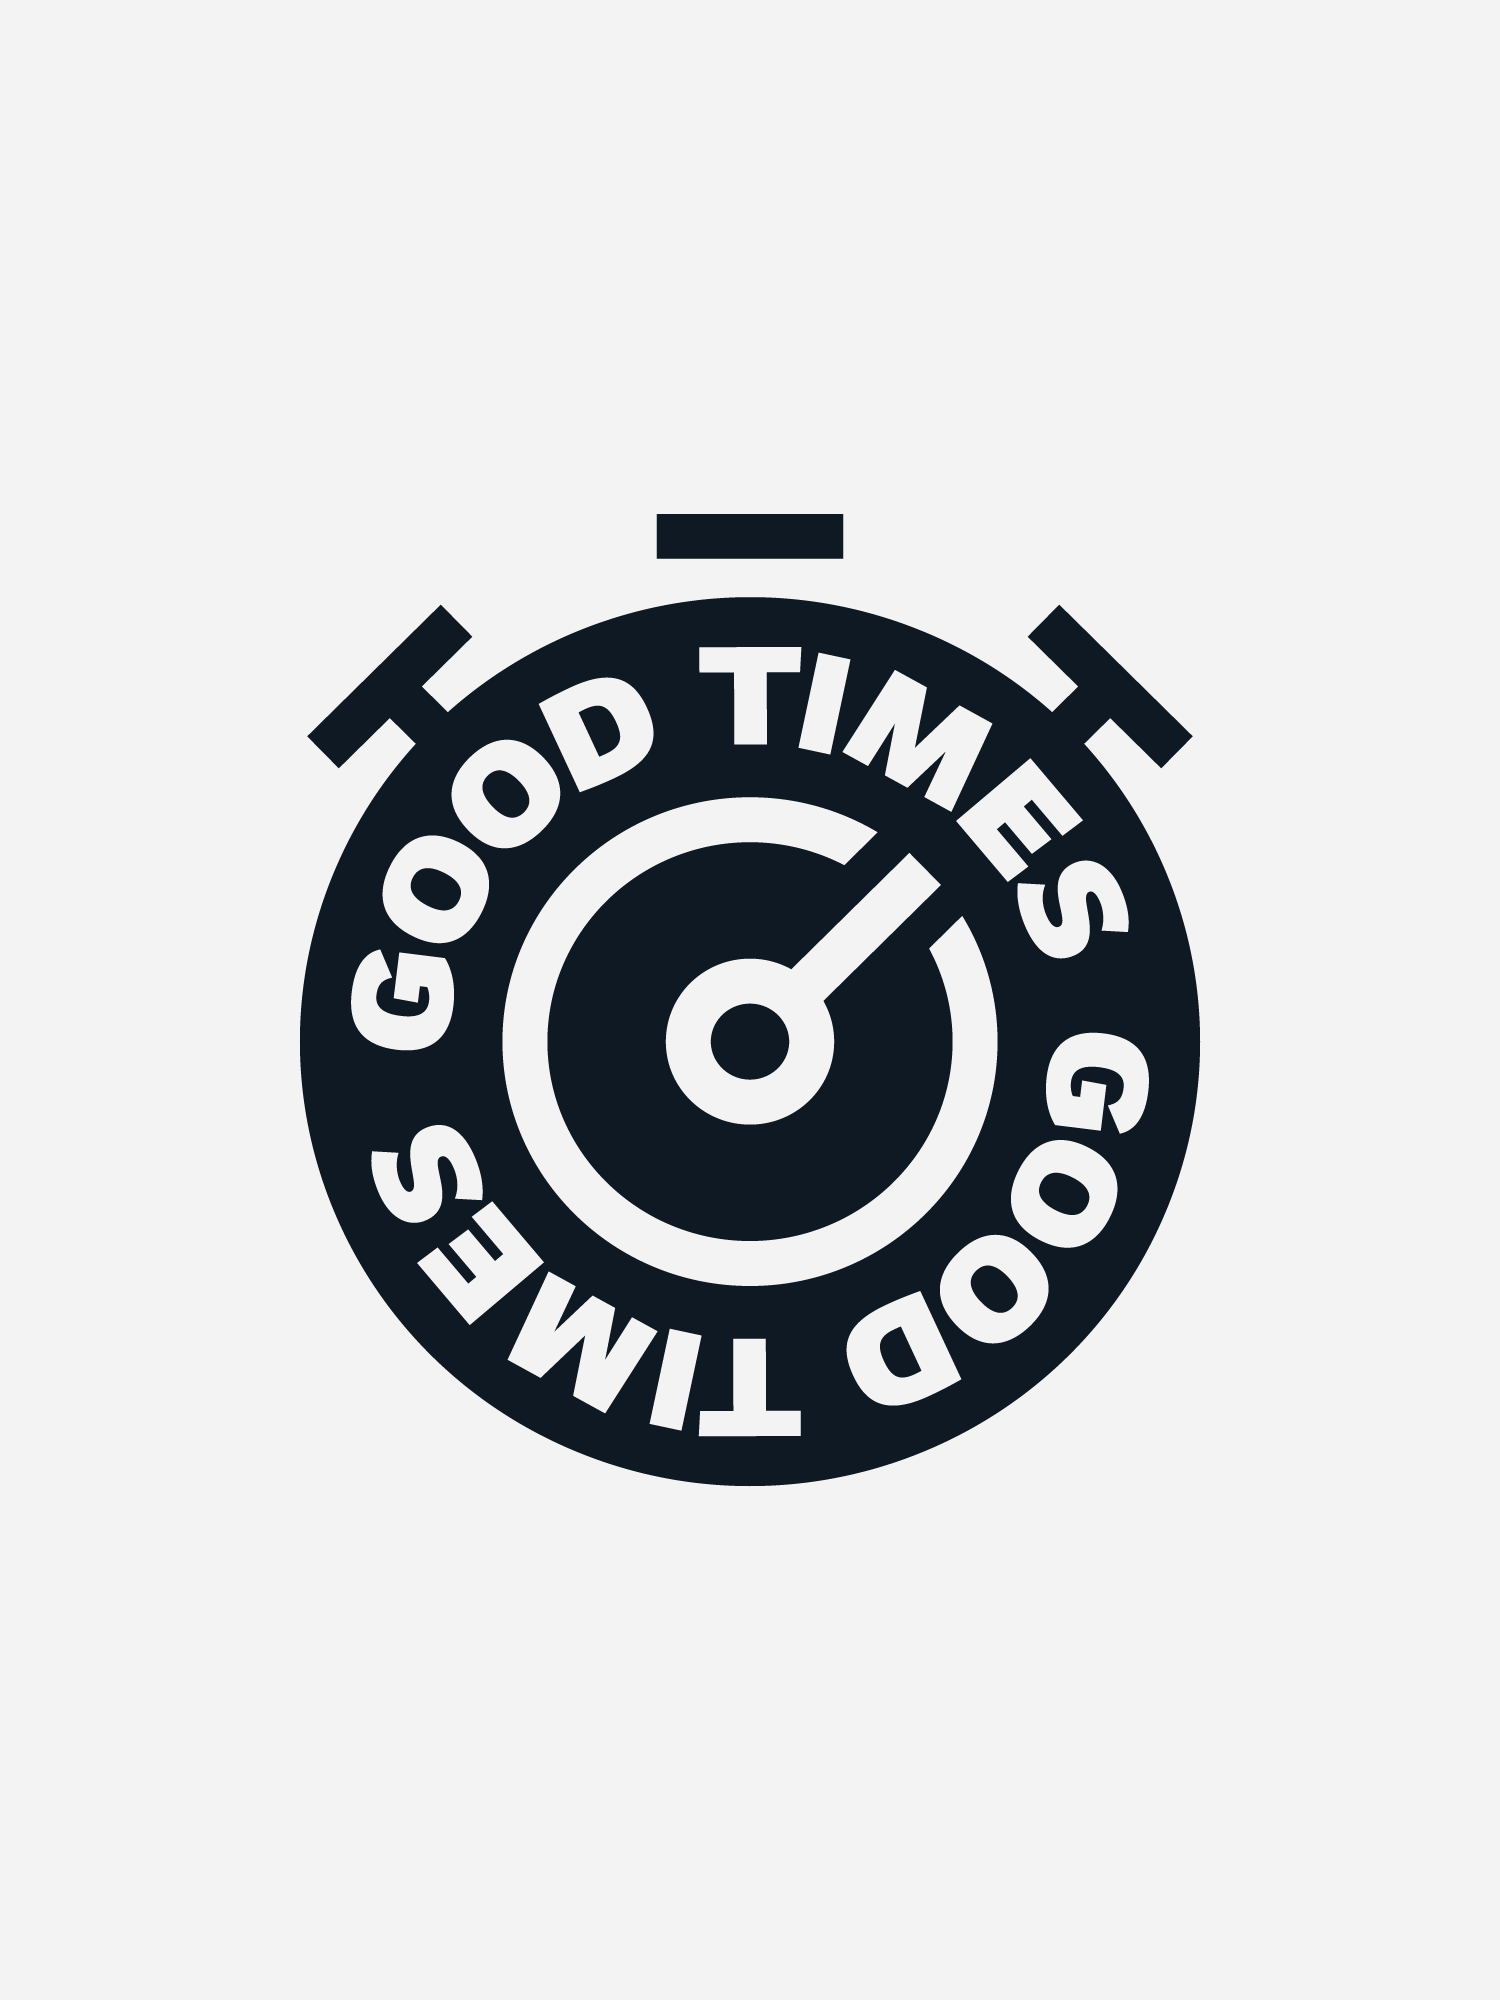 Black Back Bay Run Club 'Good Times' stopwatch on a light grey background